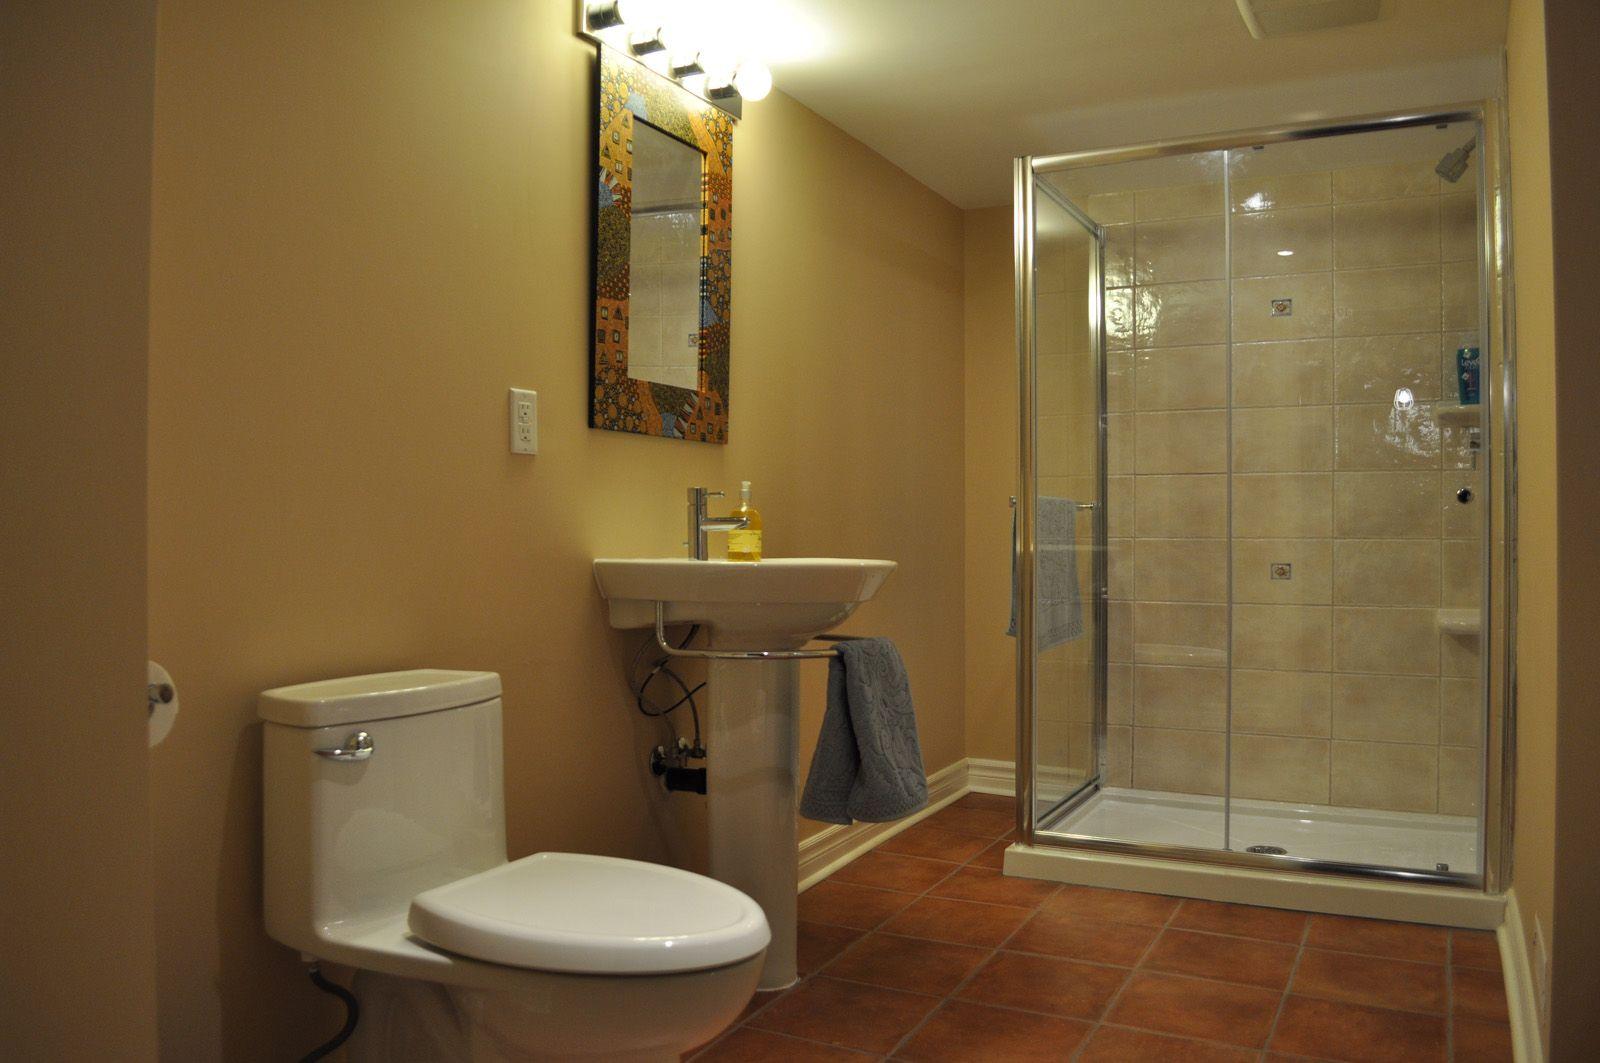 30 Amazing Basement Bathroom Ideas For Small Space  Basement Mesmerizing Basement Bathroom Design Ideas Design Inspiration